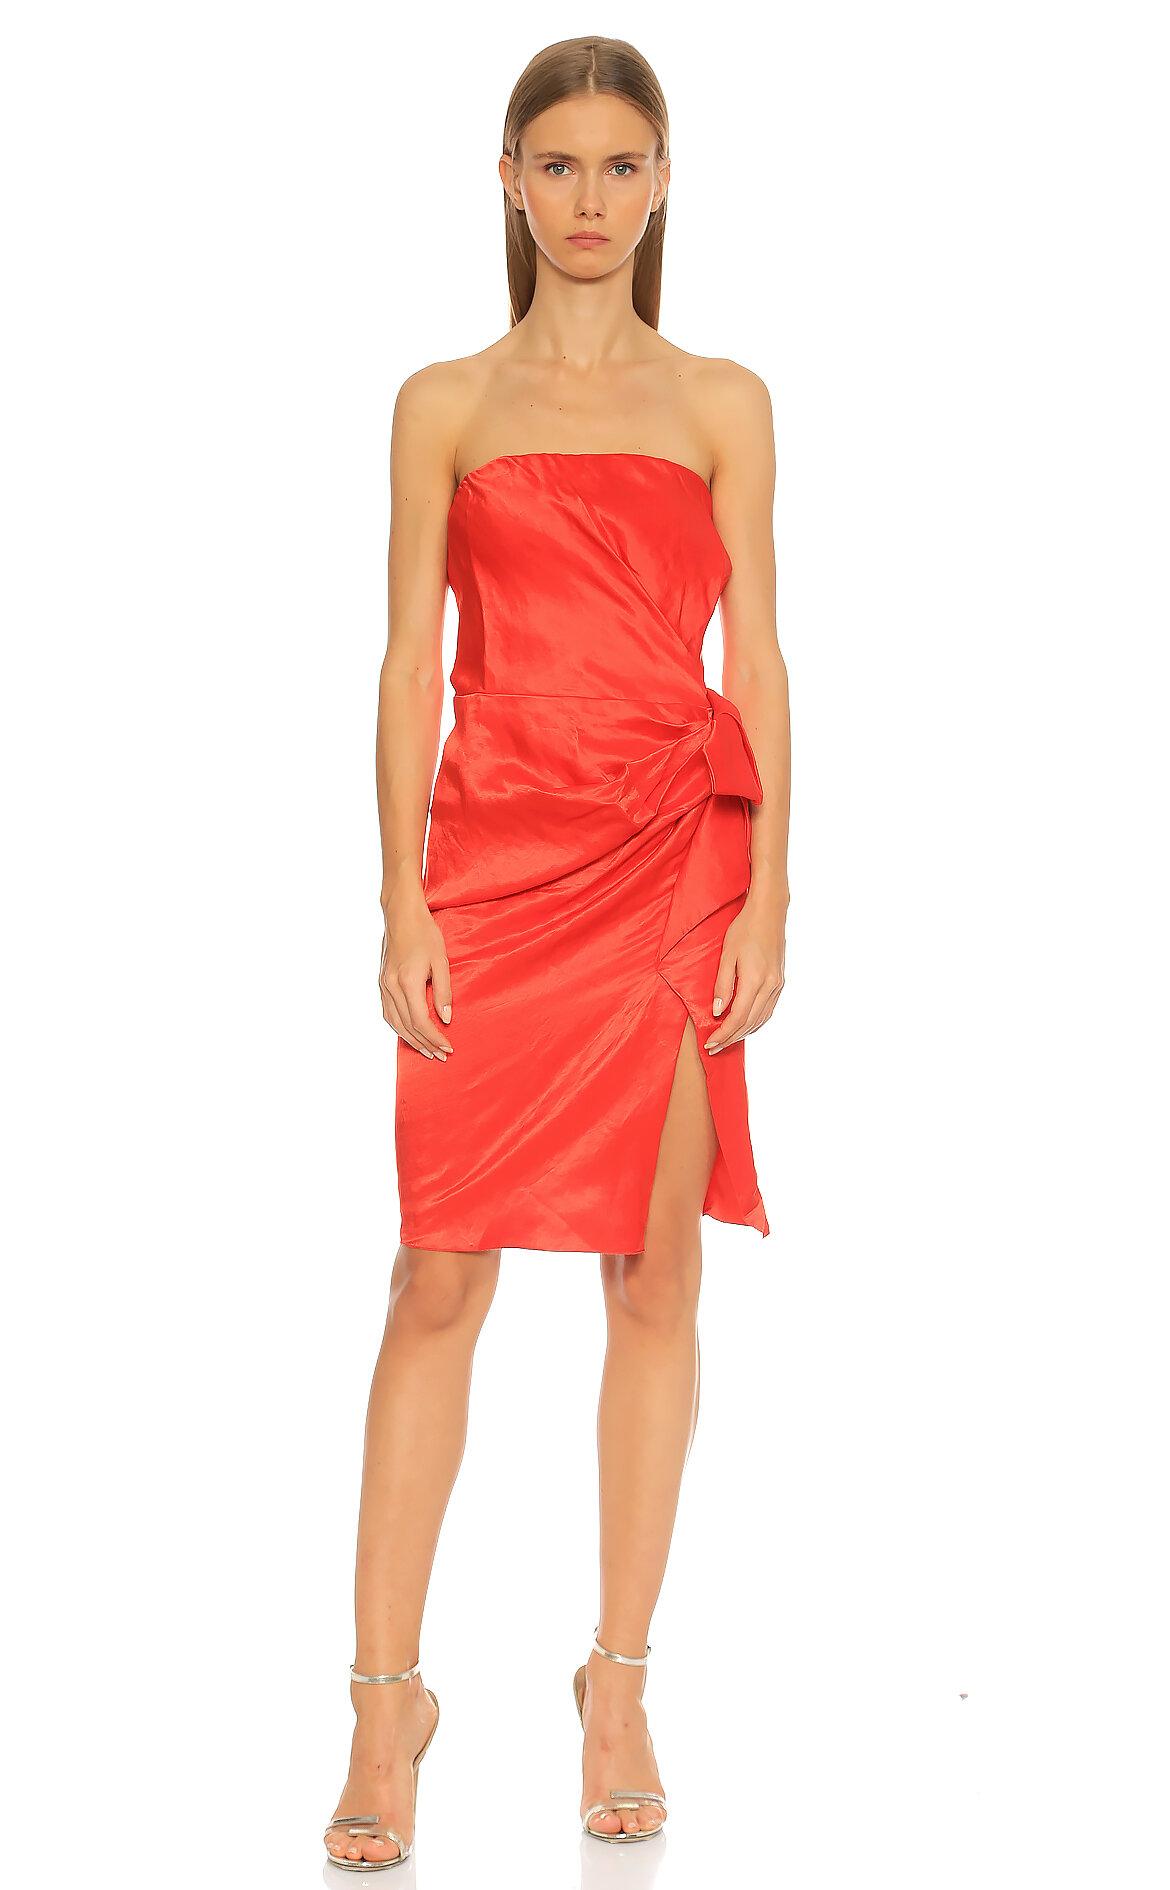 Lanvin-Lanvin Straplez Kırmızı Elbise